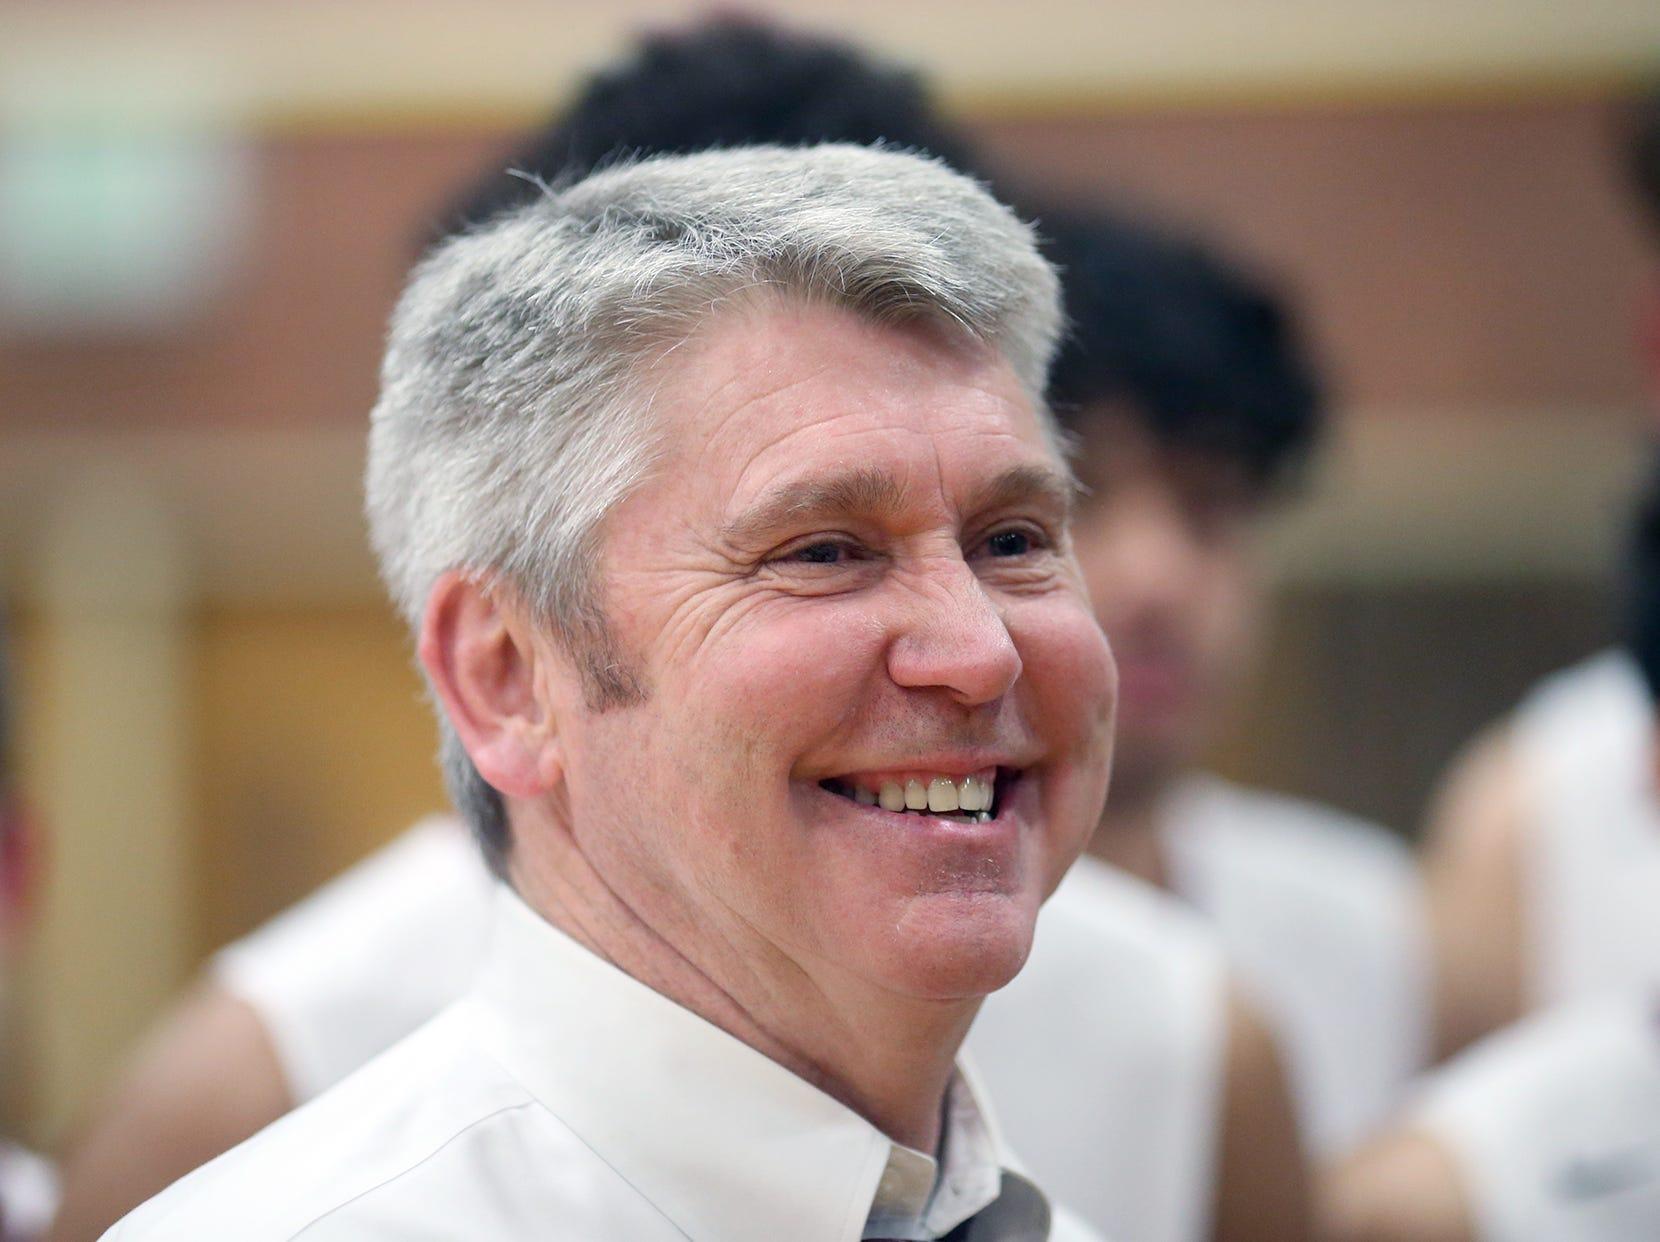 South Kitsap High School varsity head basketball coach John Callaghan won his 300th game against Bellarmine at South Kitsap on Thursday, January 17, 2019.